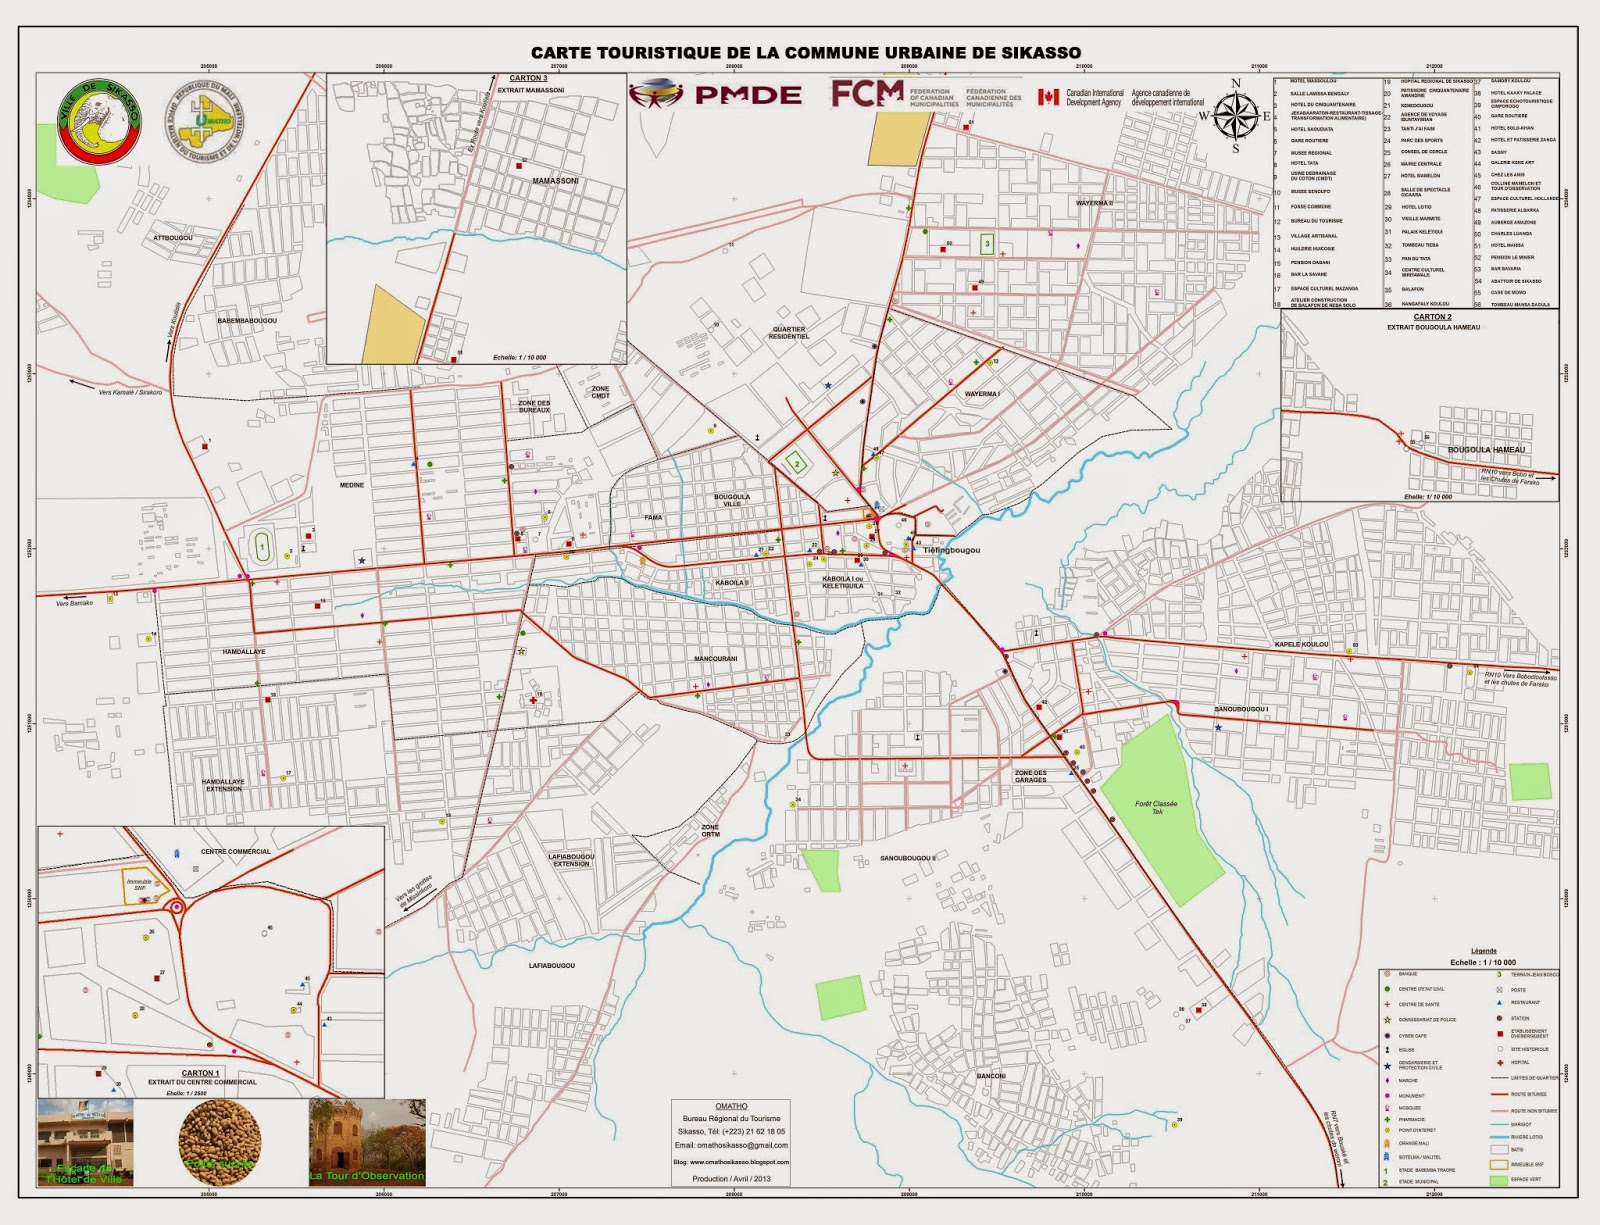 Carte touristique de la Commune Urbaine de Sikasso